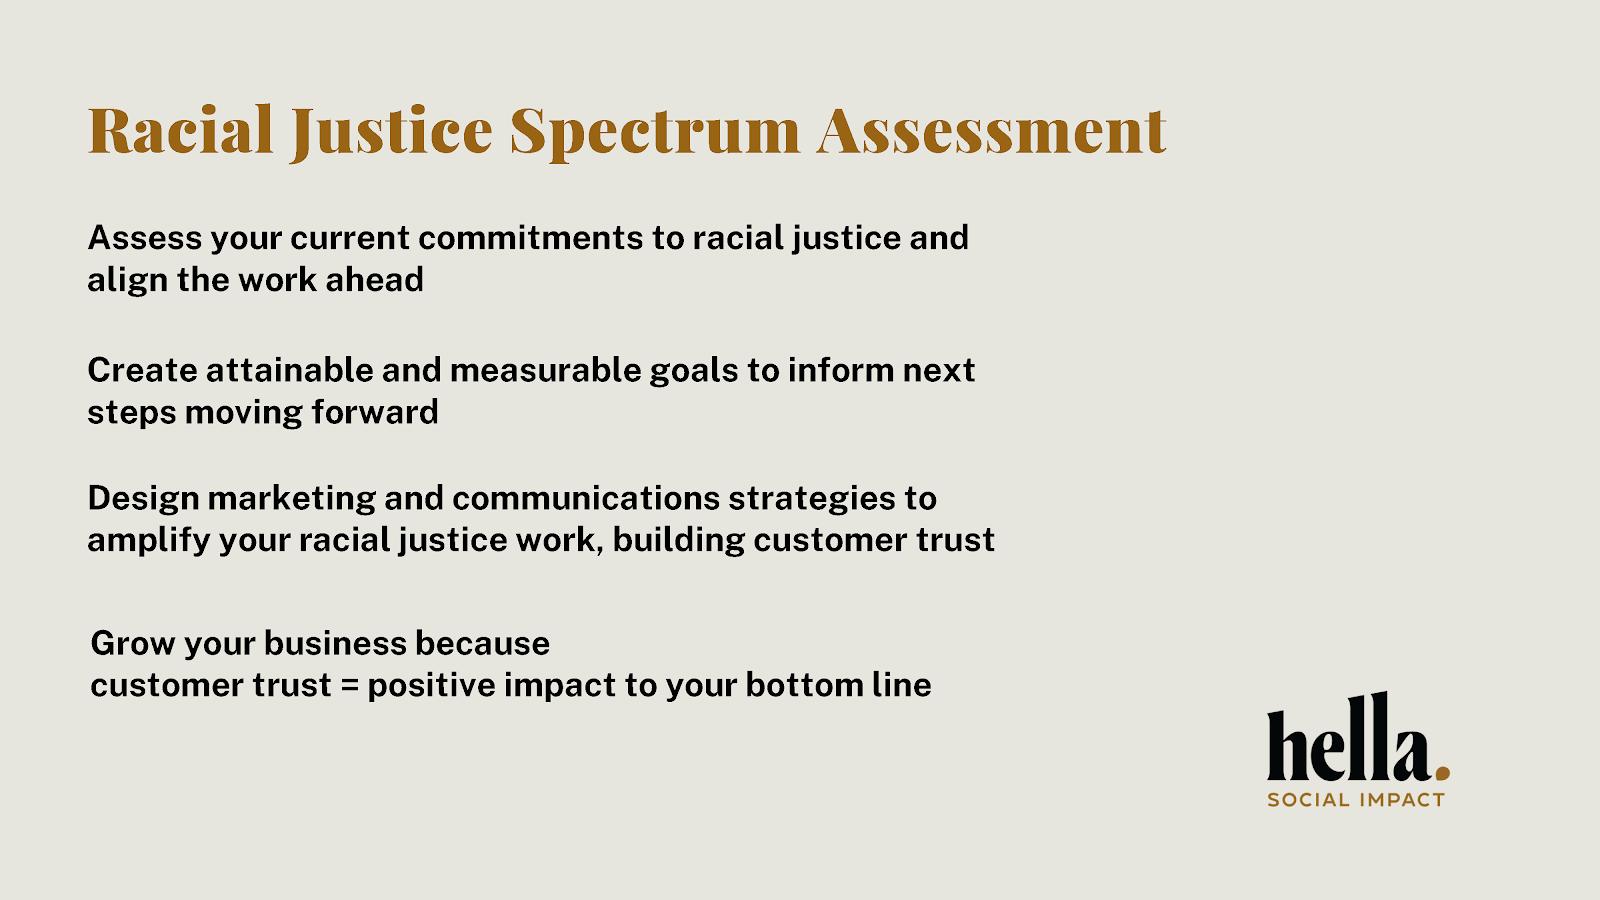 radical justice spectrum assesment